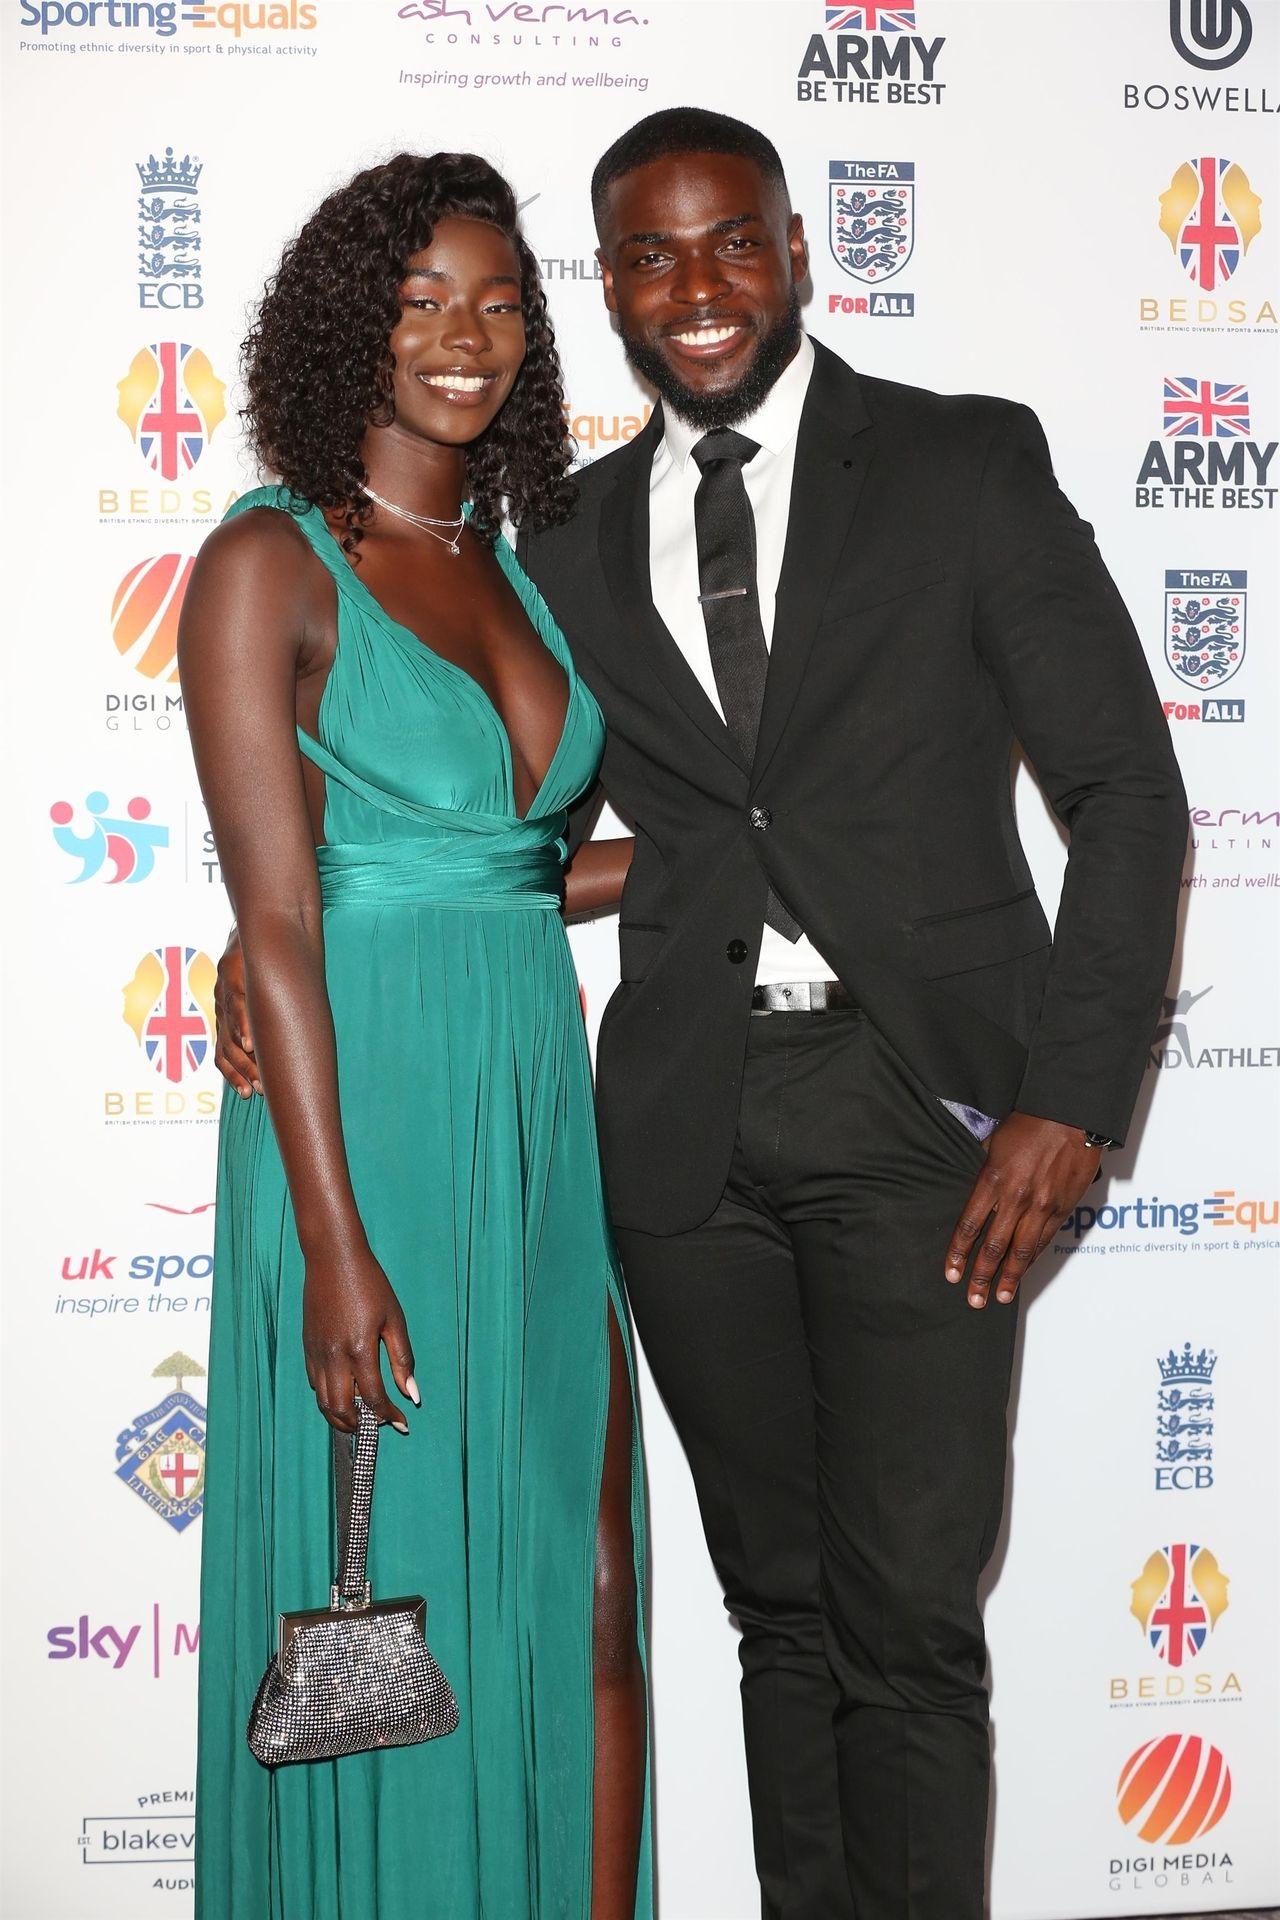 Mike Boateng & Priscilla Anyabu Are Seen At British Ethnic Diversity Sports Awards 0007